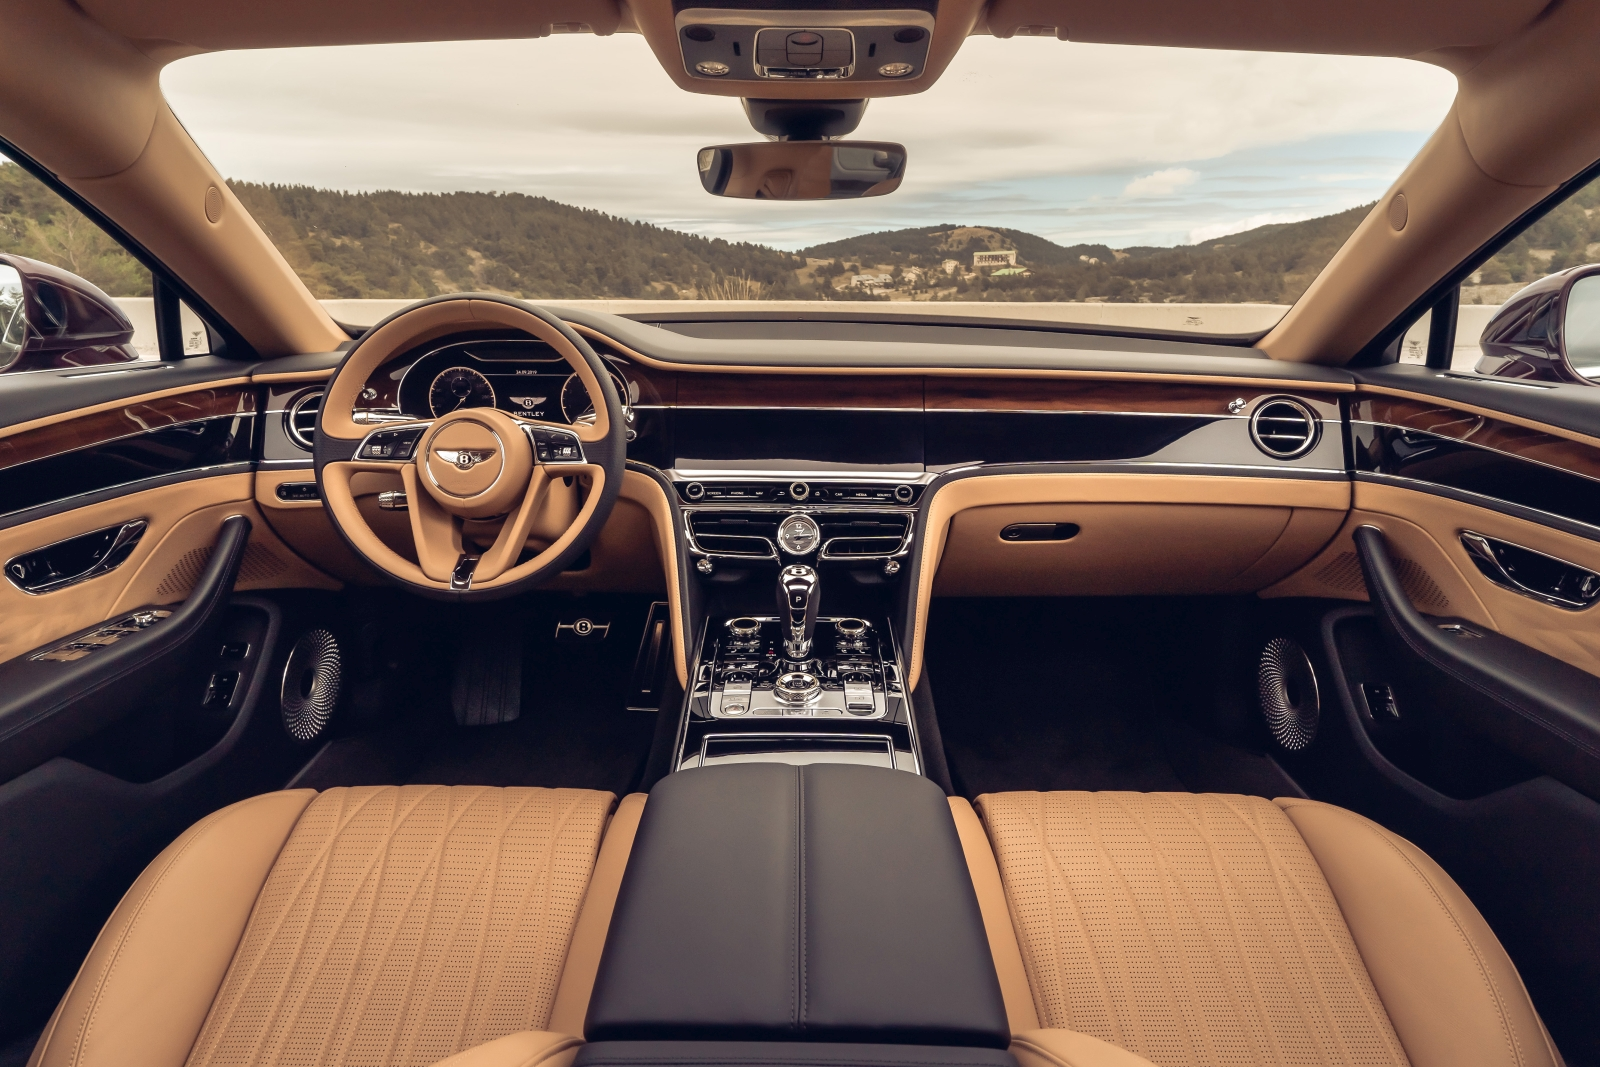 Bentley Rotating Display - 2